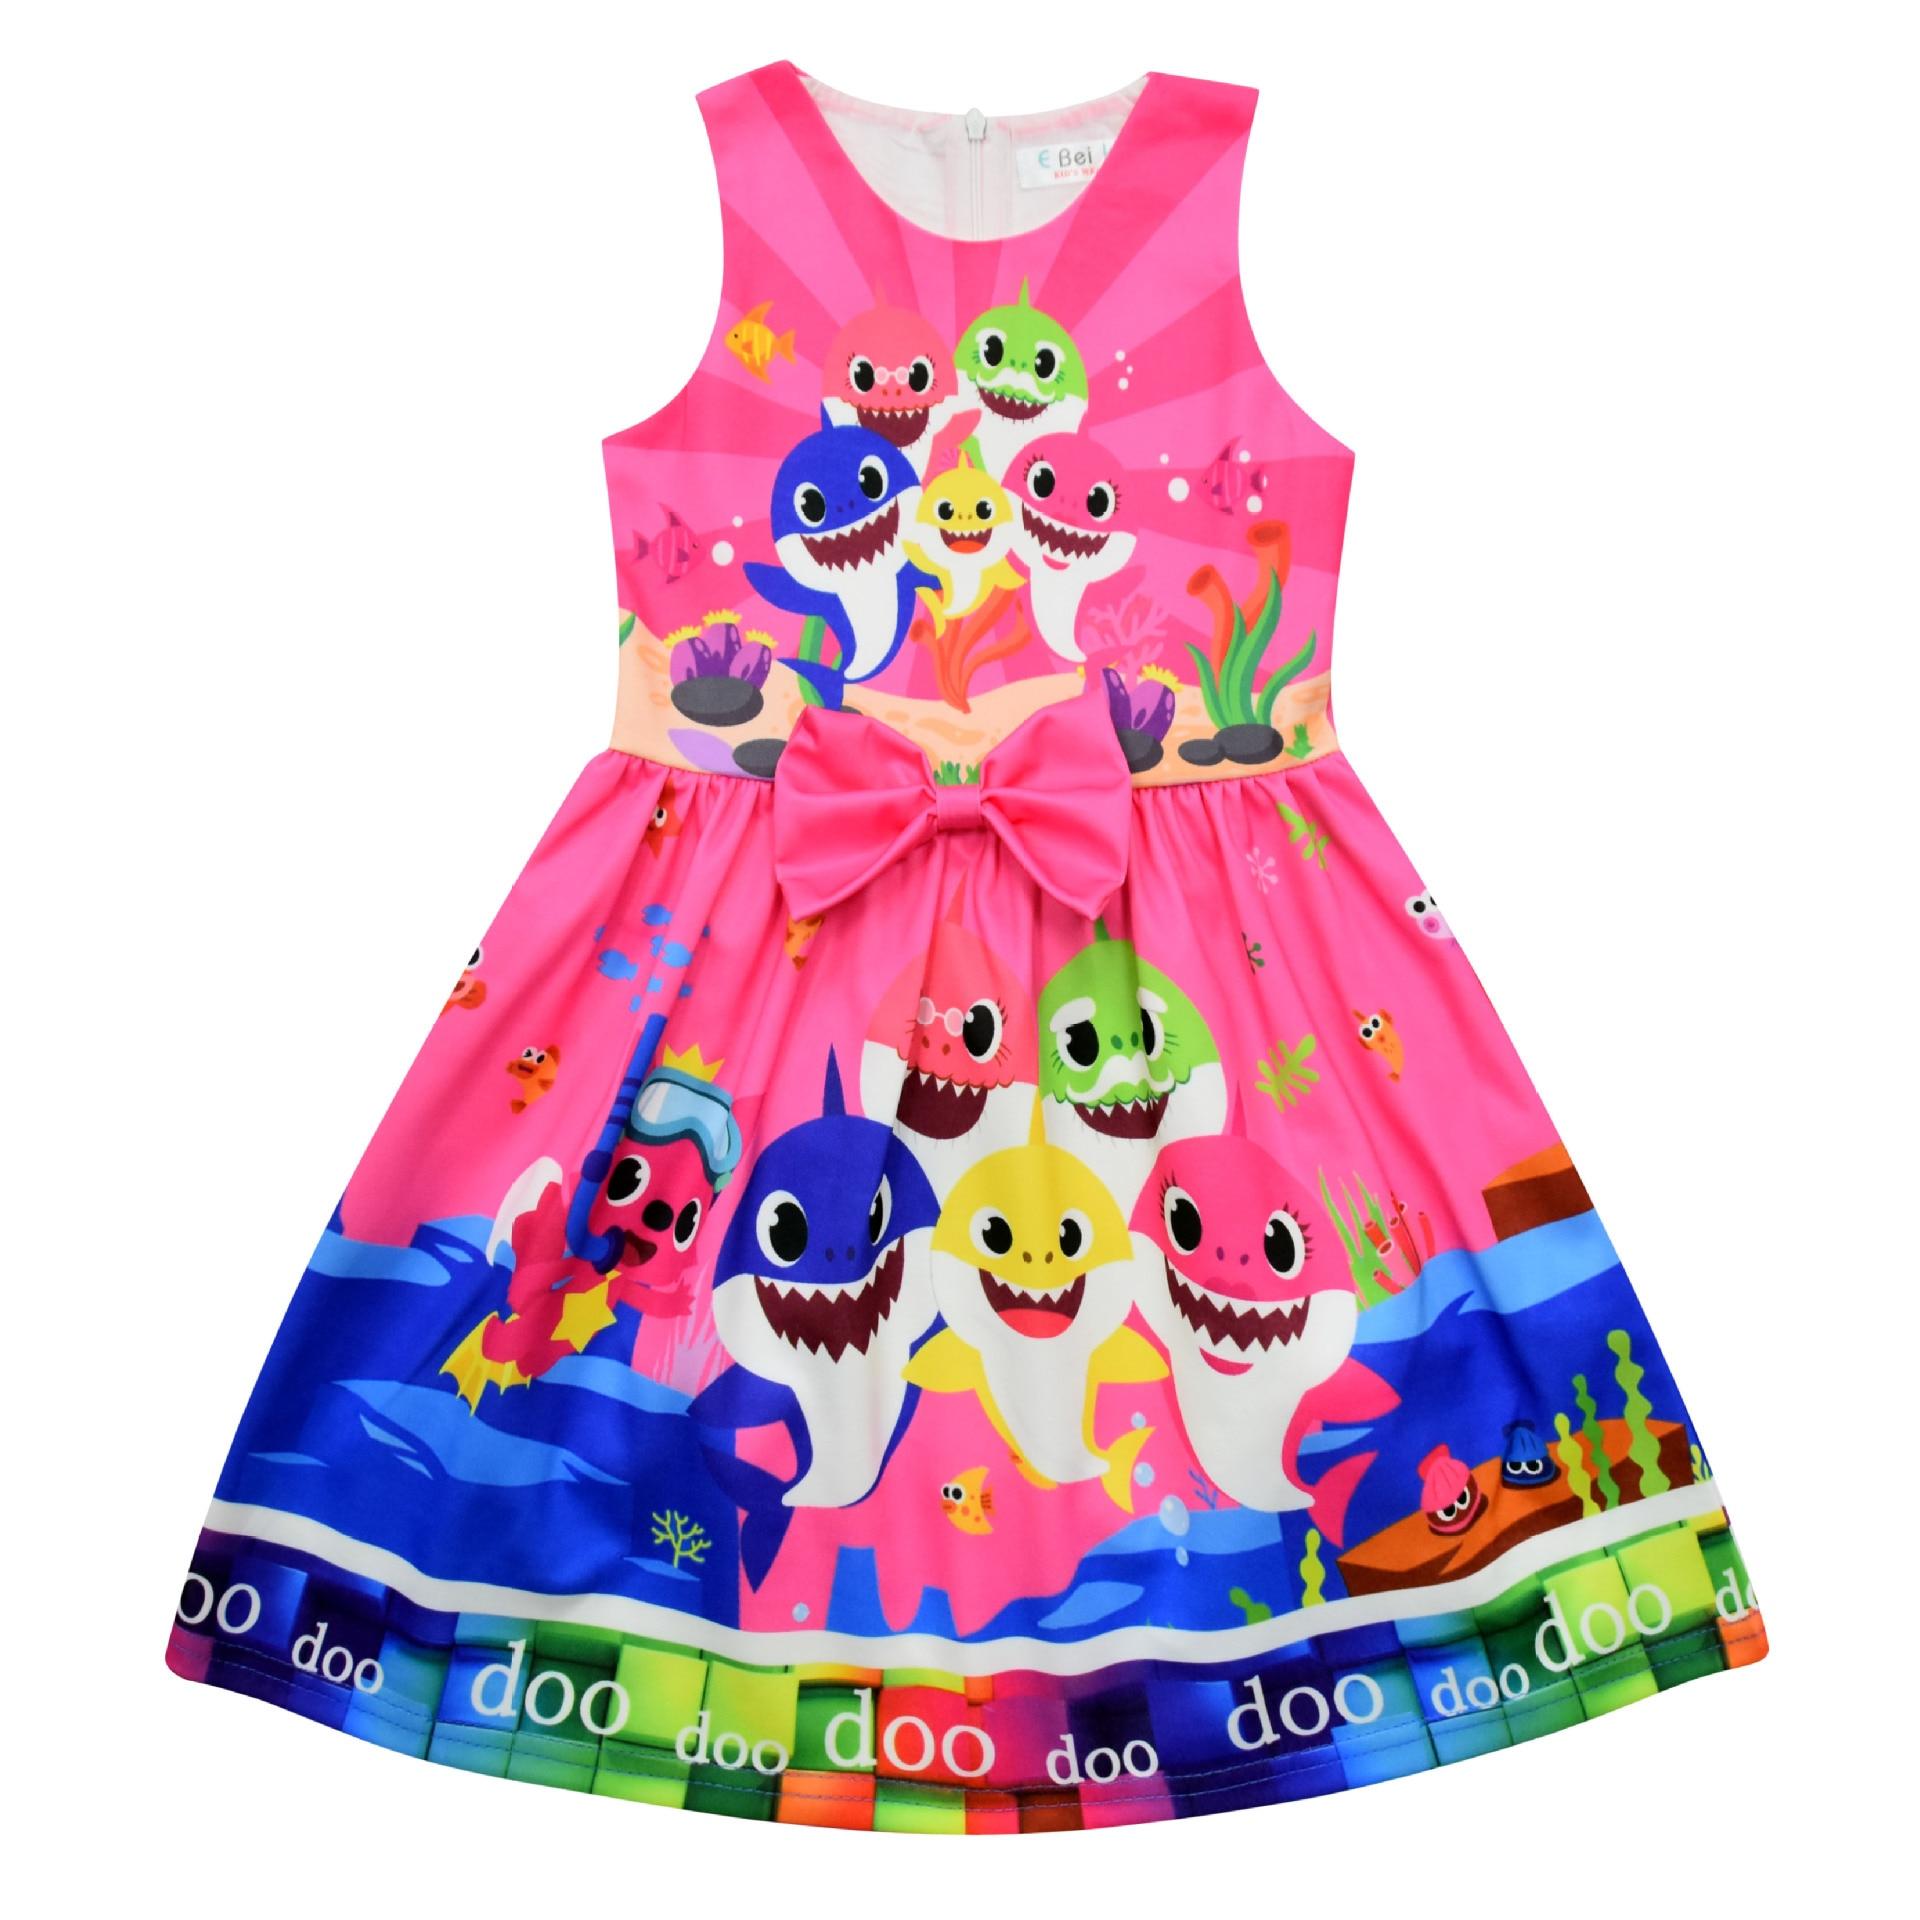 New Summer Surprise Girl Princess Dress Cute Cartoon Unicorn Party Dress Children Clothing 6